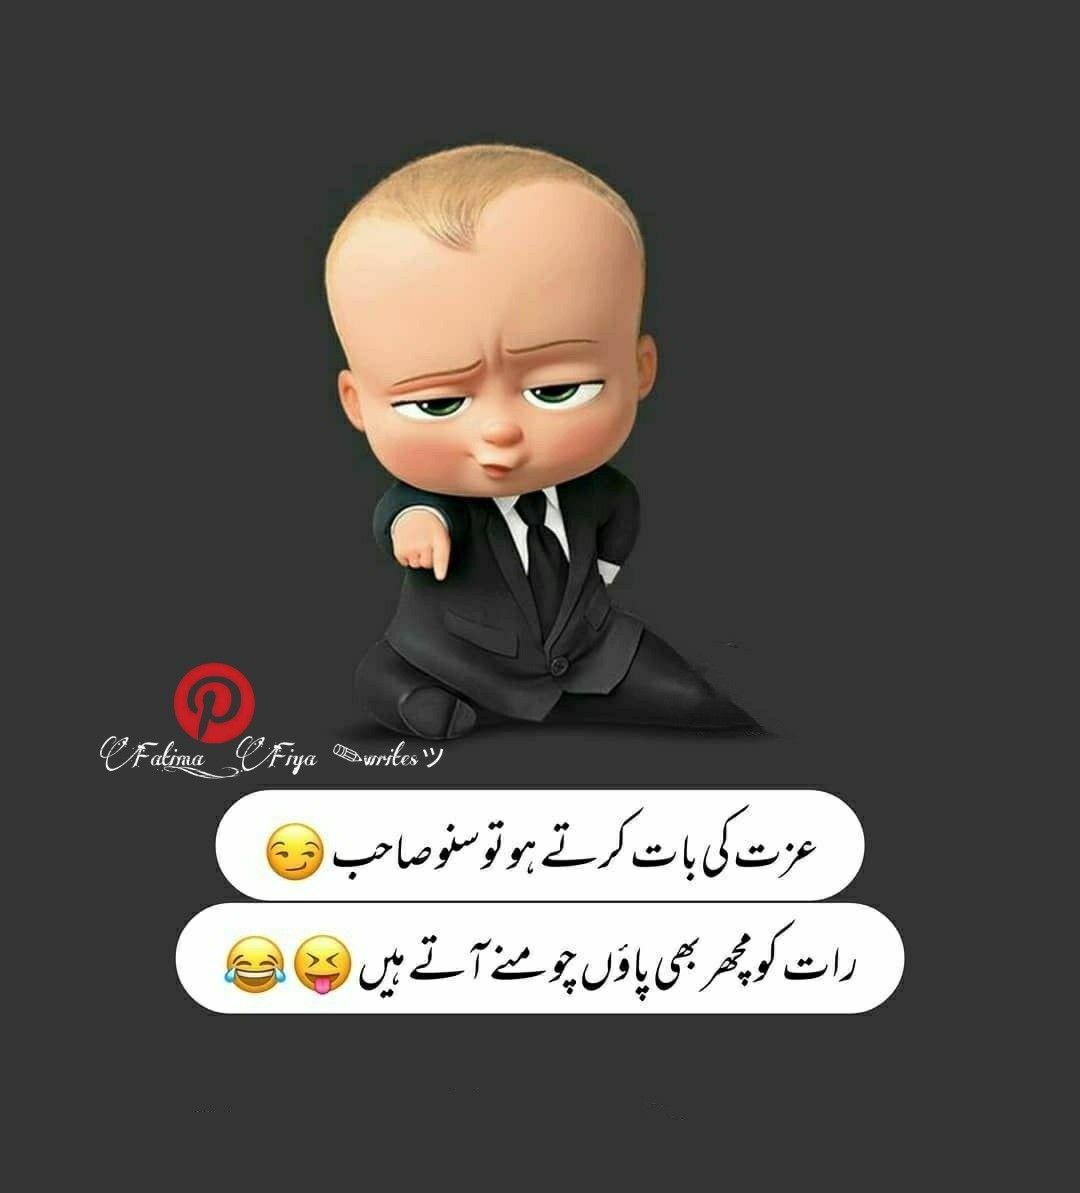 Pin By ɓʋƭƭyeʀƒլƴ On Urdu Line S Funny Girly Quote Cute Funny Quotes Funny Girl Quotes